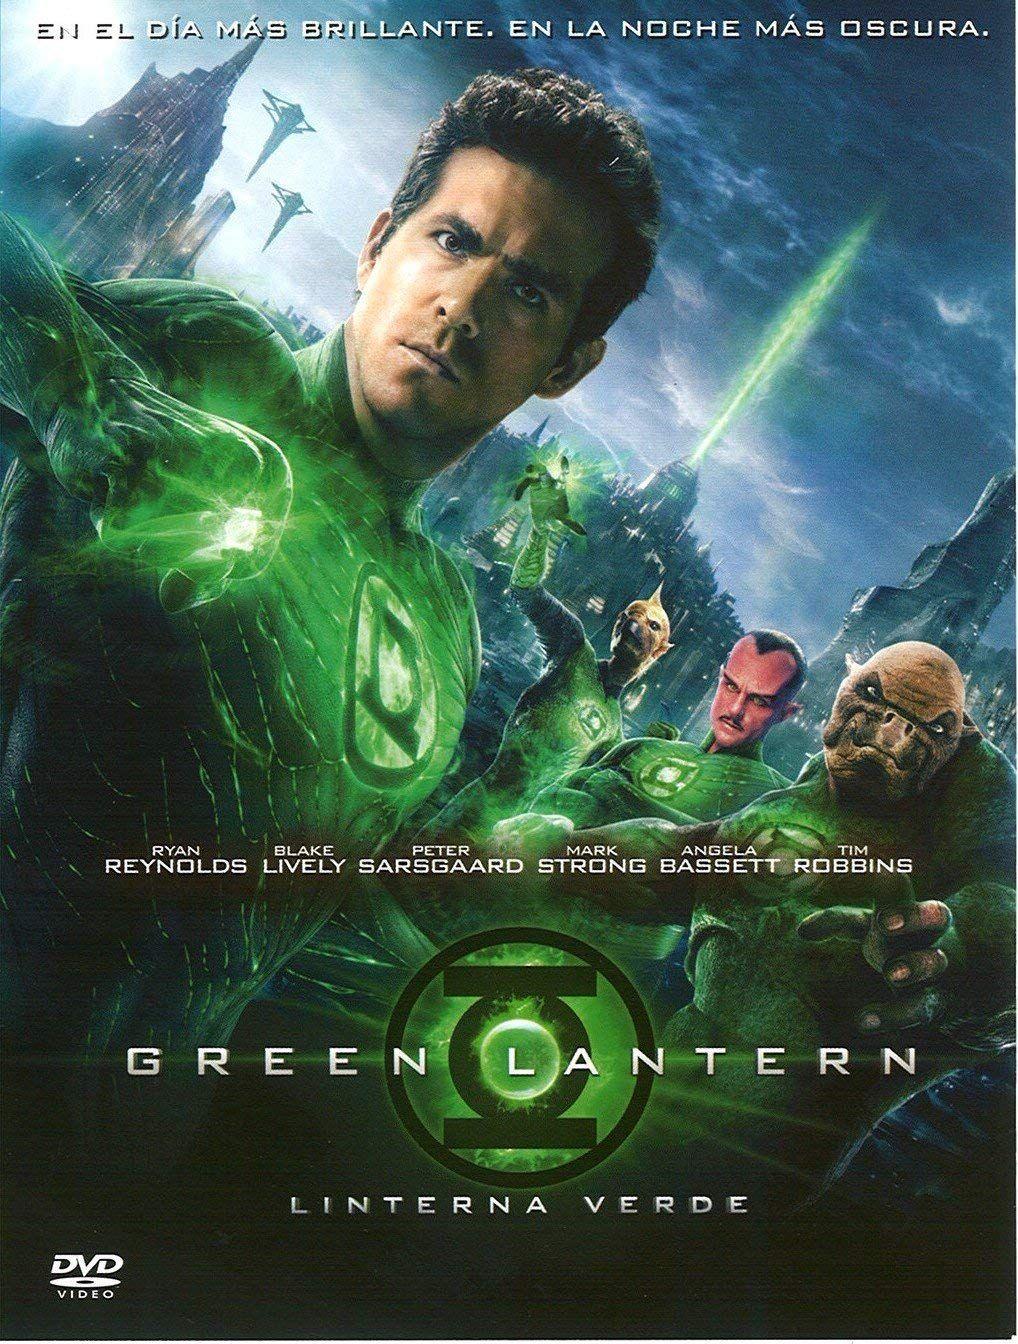 Linterna Verde [DVD] Linterna, Verde, DVD Green